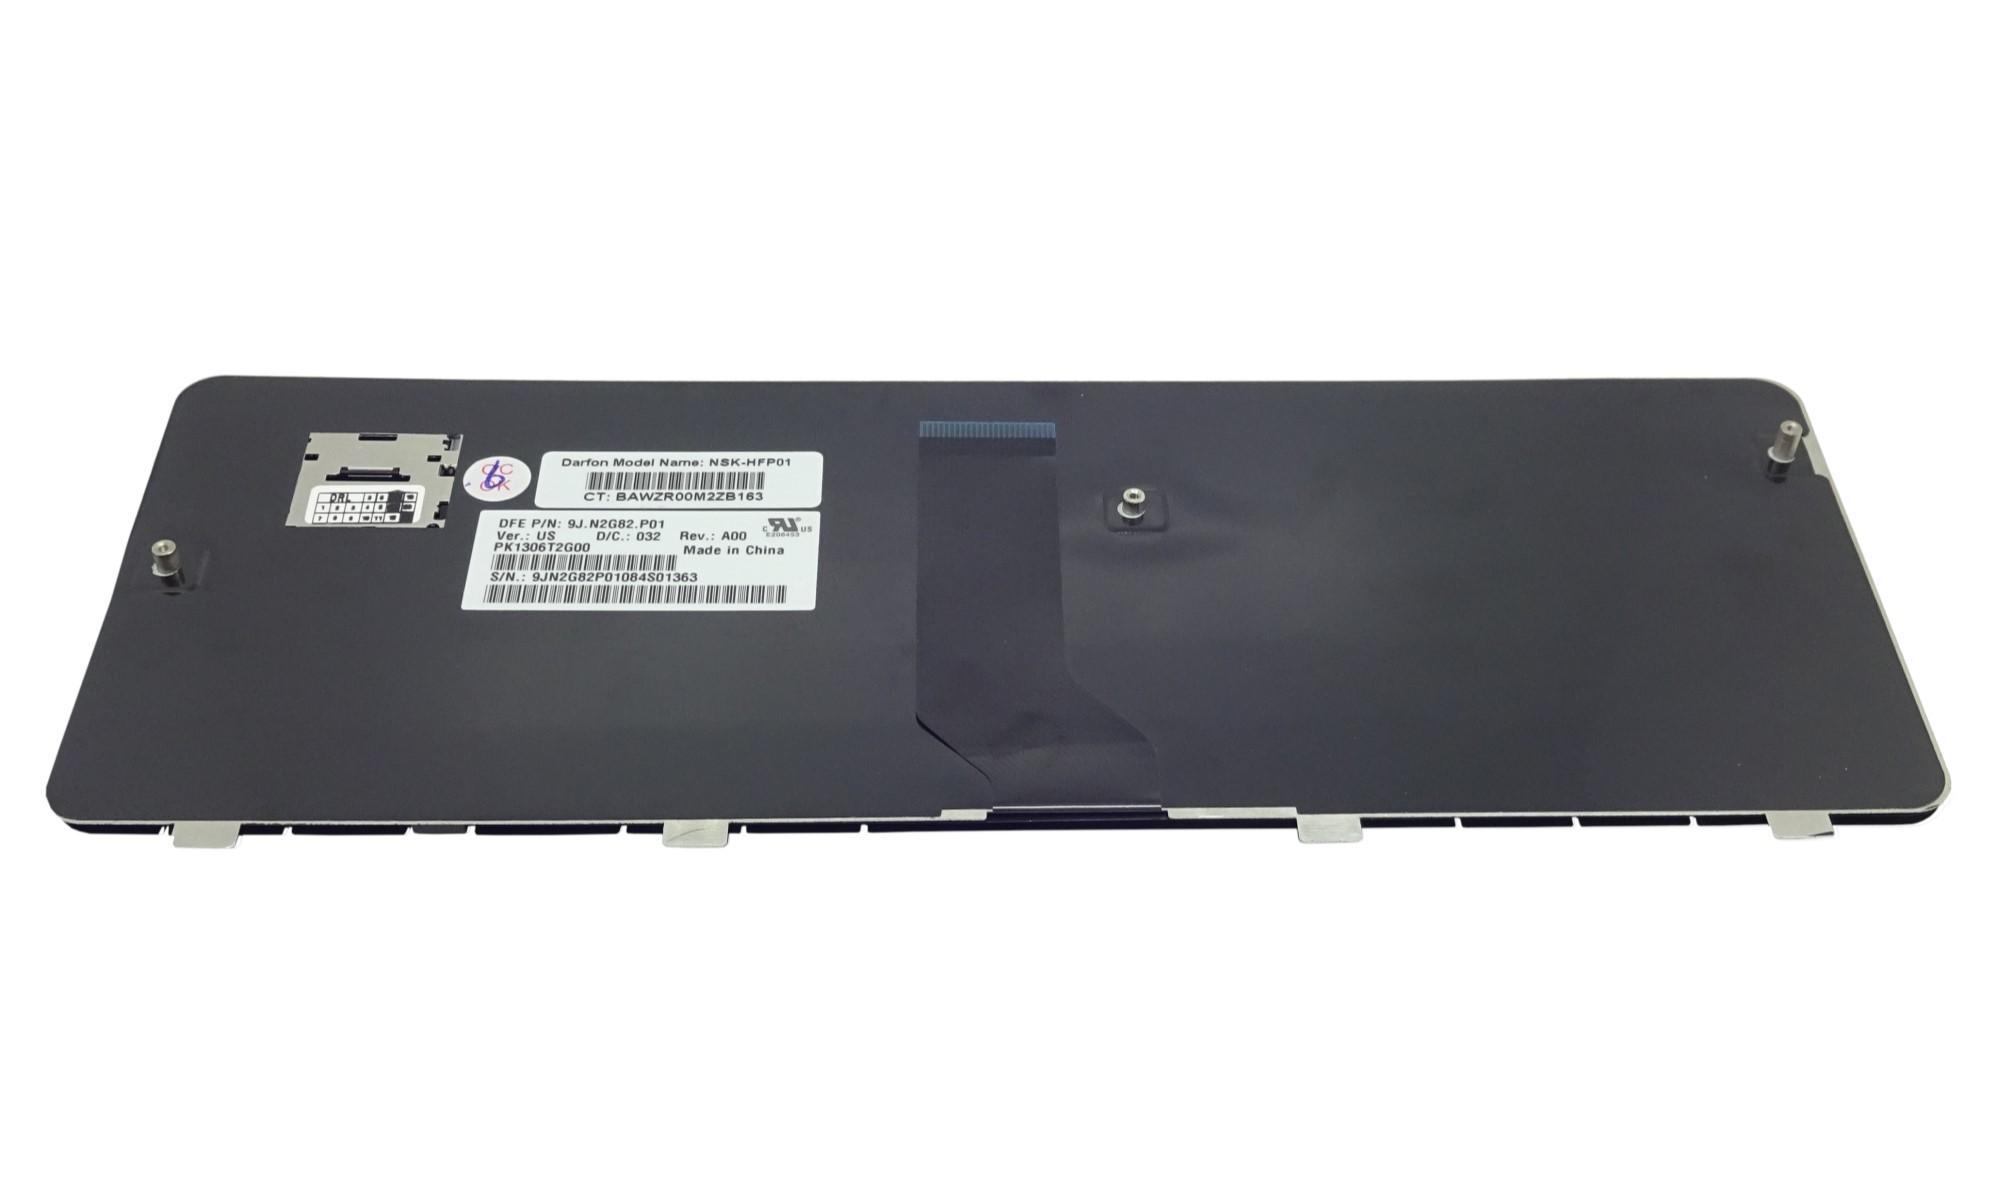 Tastatura compatibila HP Pavilion DV3-1000, DV3-2000, DV3-2100, DV3-2200, DV3-2300, fara iluminare, albastru inchis, lucios